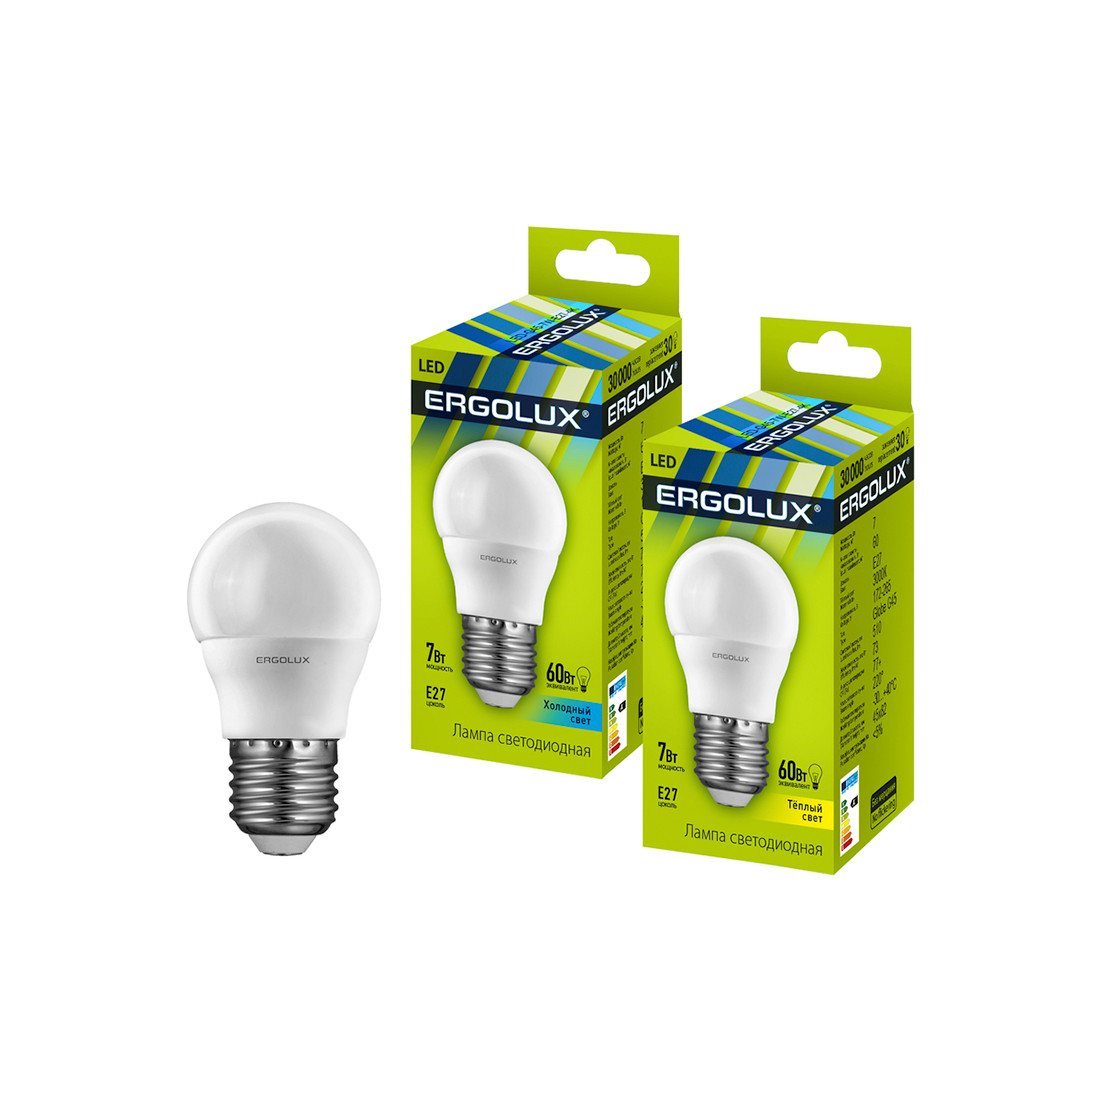 Эл. лампа светодиодная Ergolux LED-G45-7W-E27-4K Шар